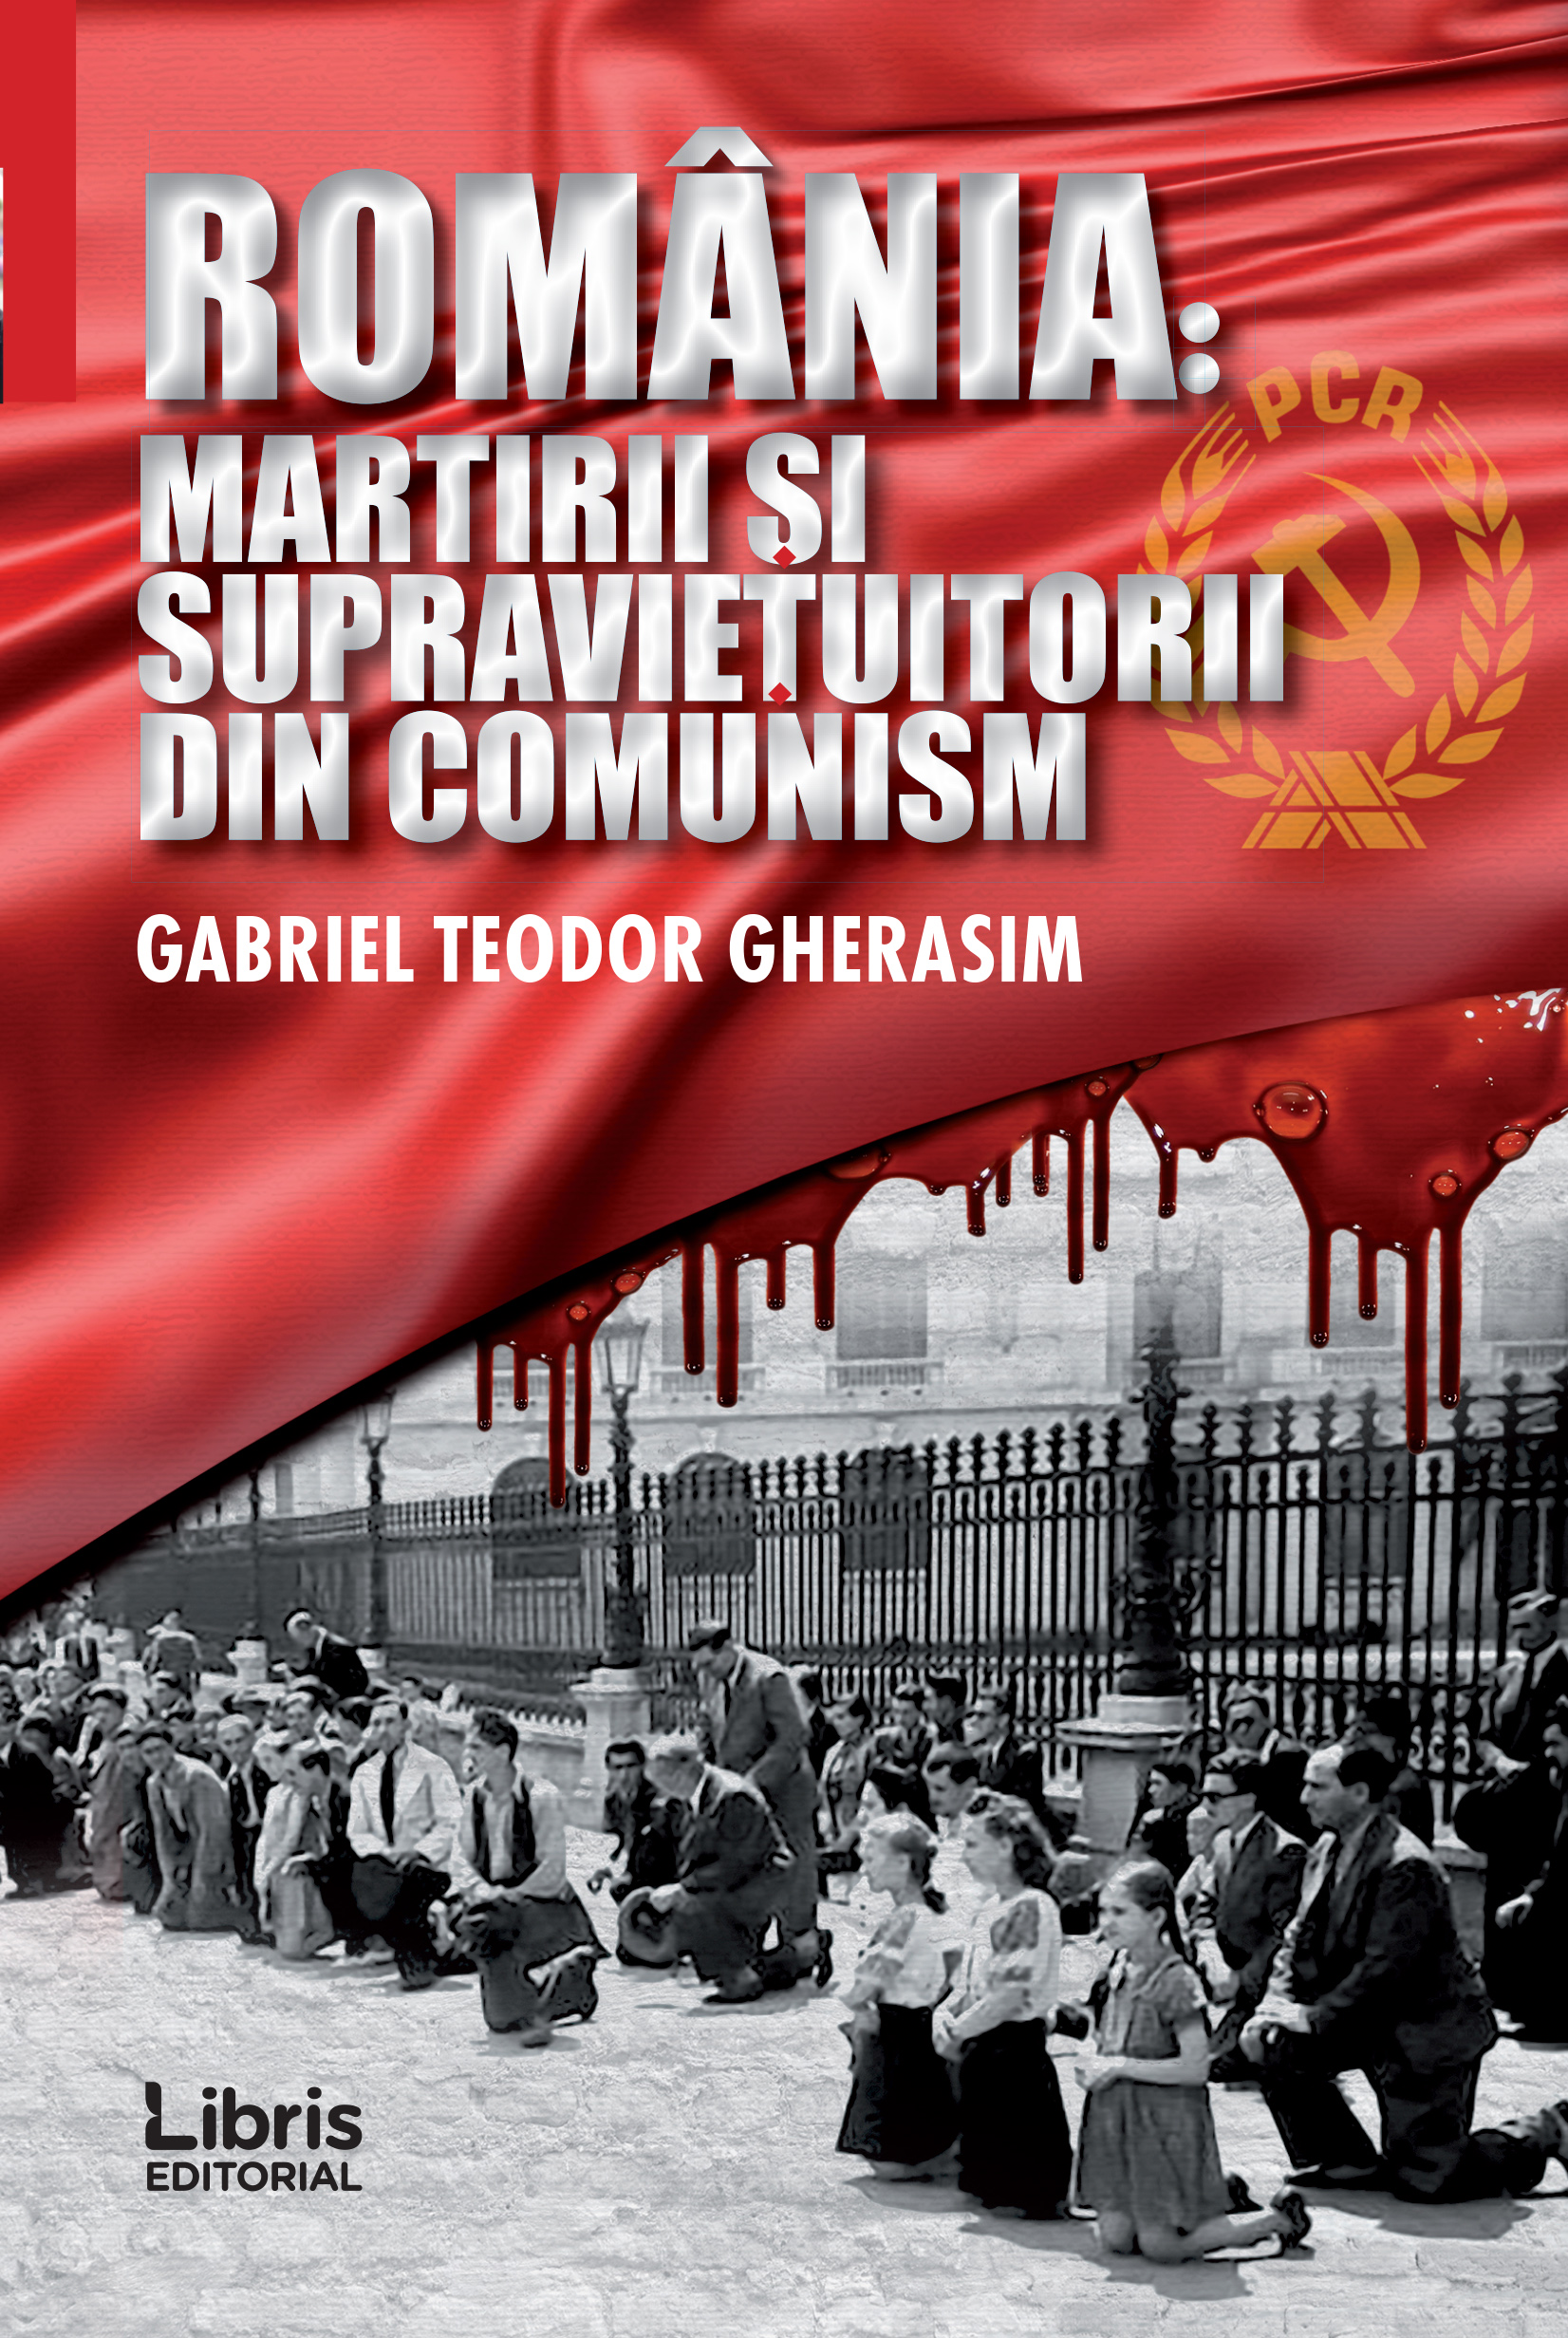 Romania: Martiri si supravietuitorii din comunism